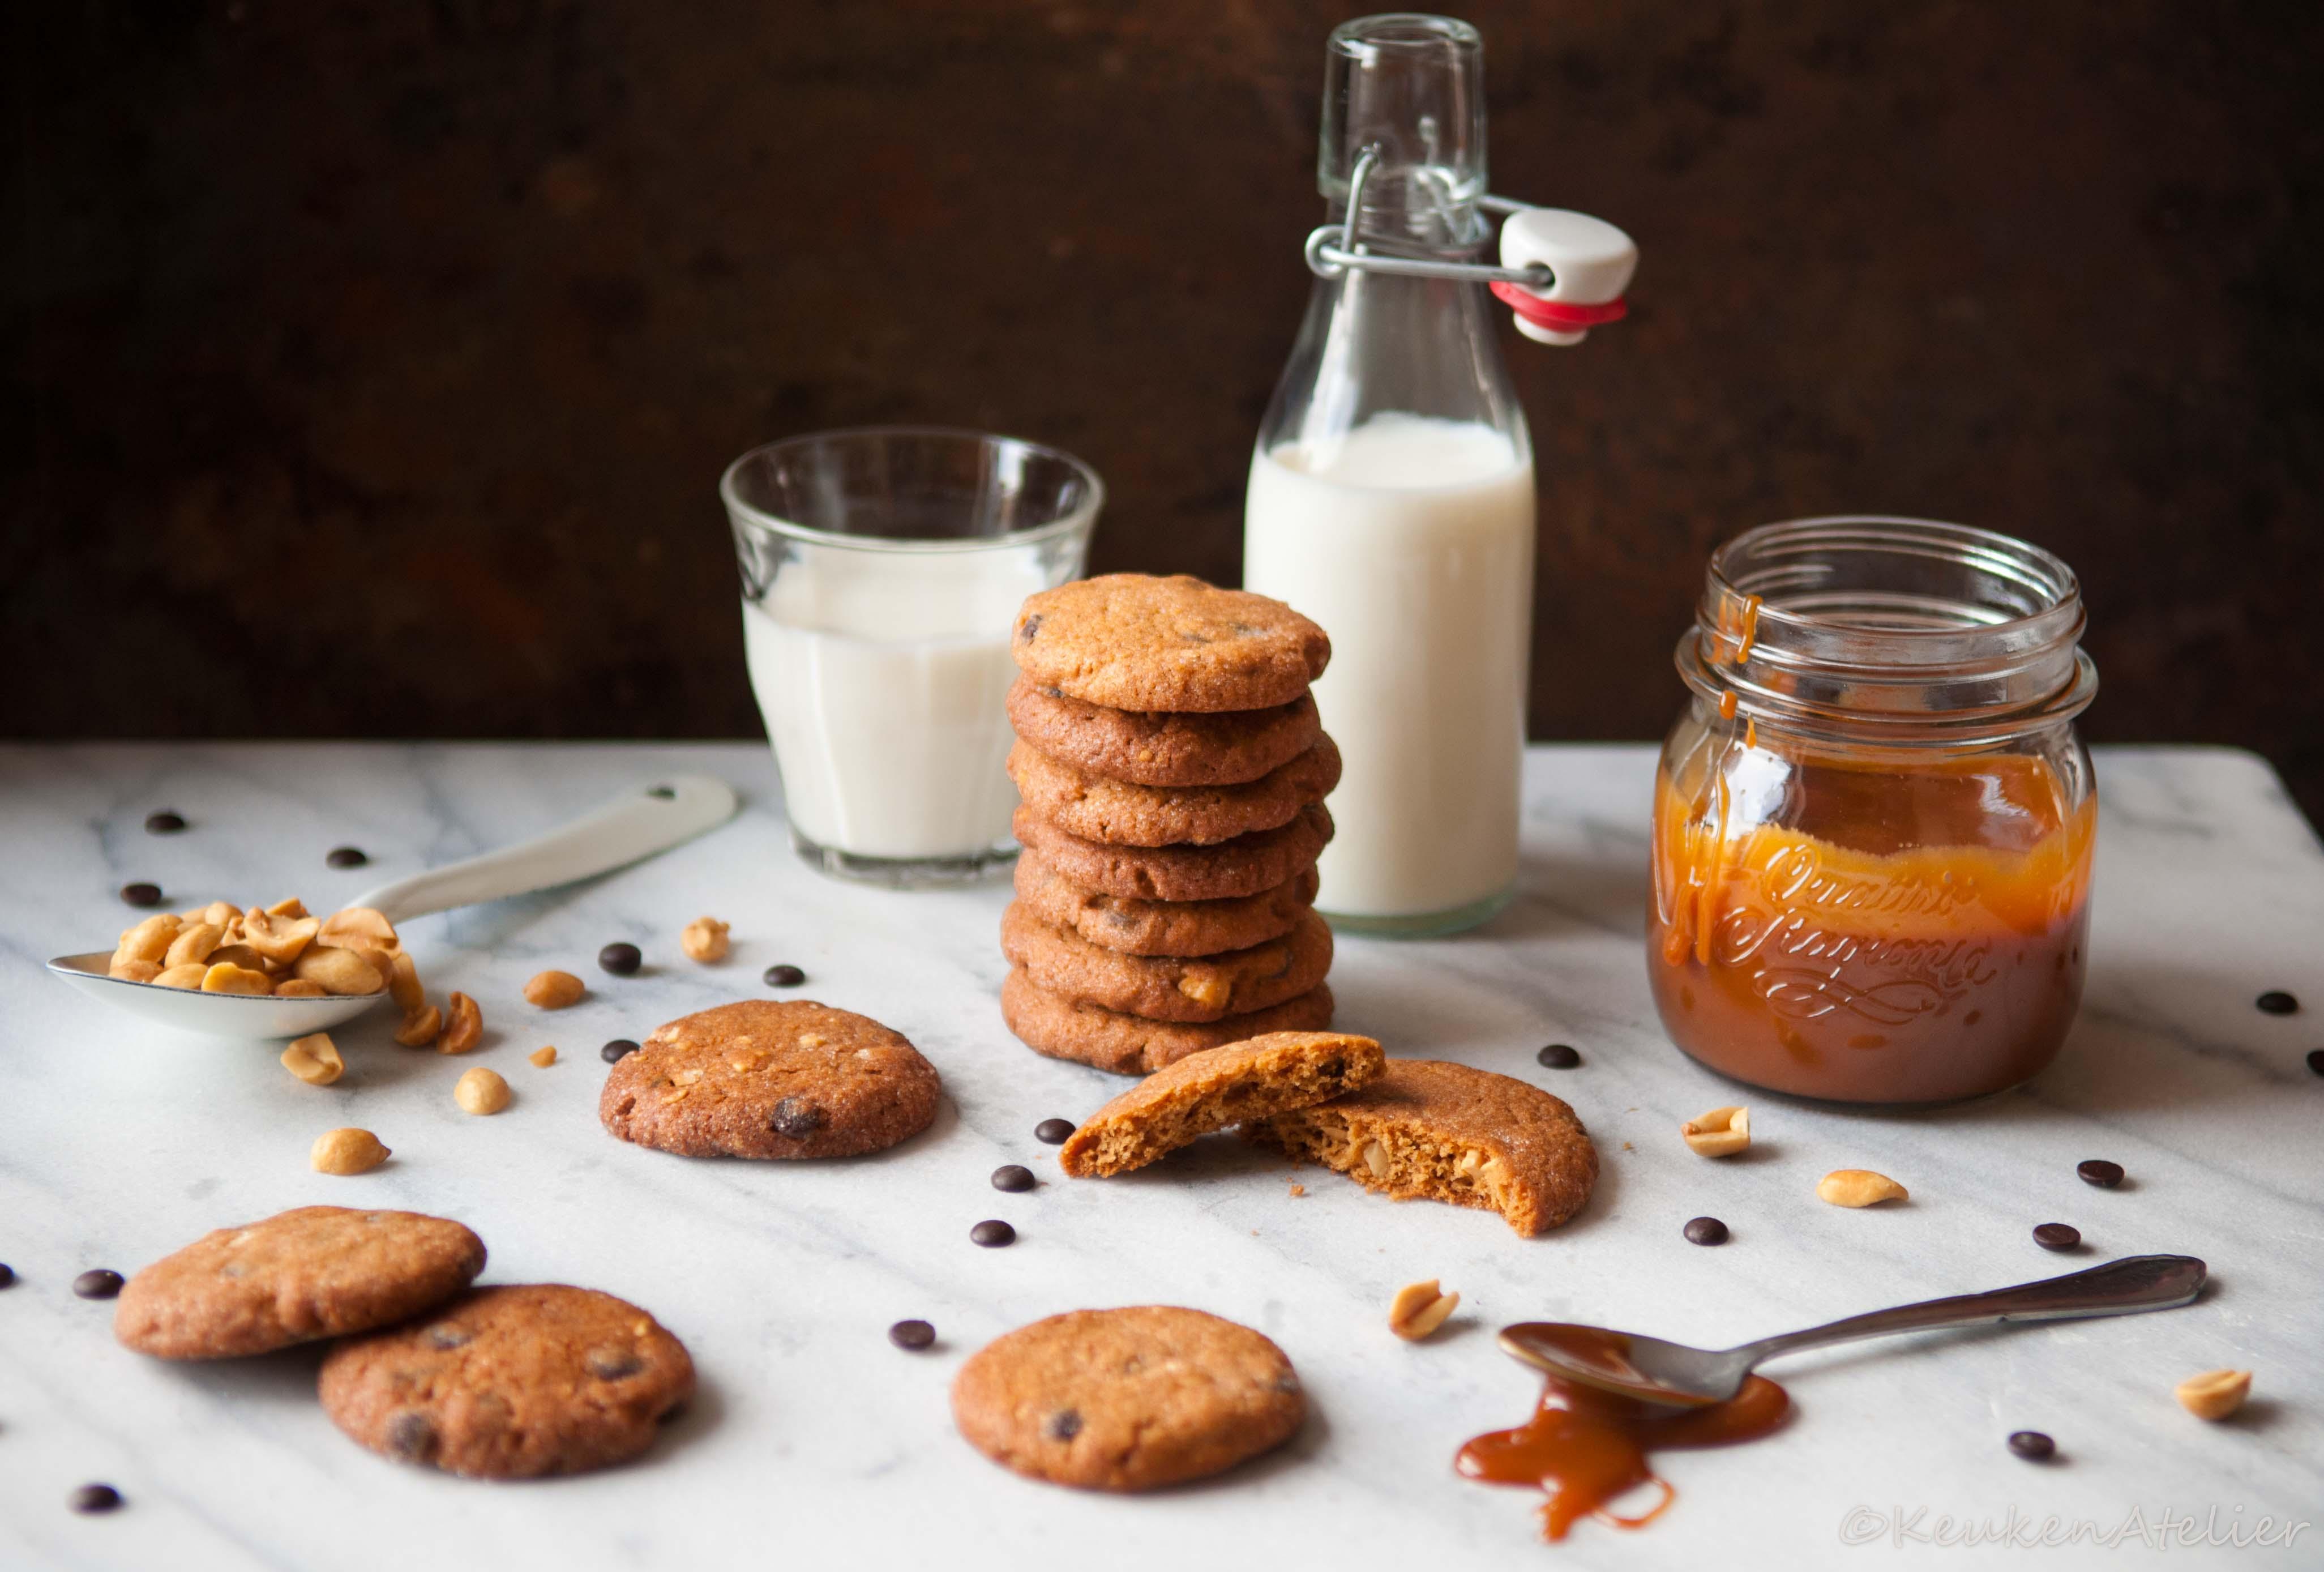 Chocolate chip cookie met pinda en karamel 1 | KeukenAtelier.com